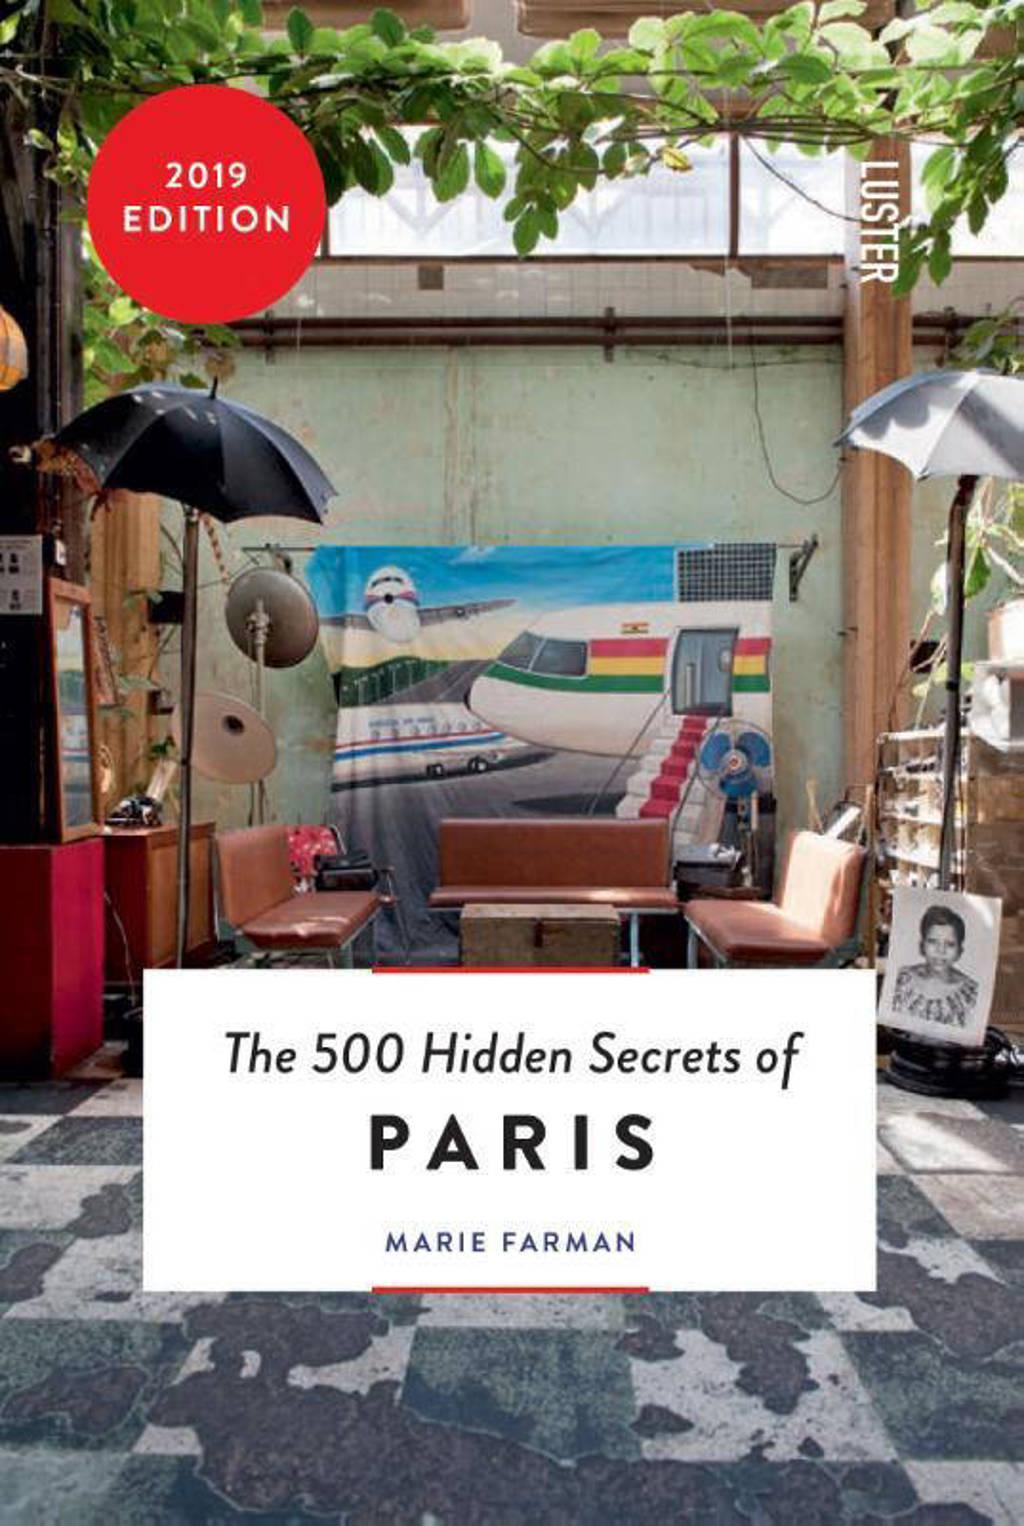 The 500 hidden secrets of Paris - Marie Farman